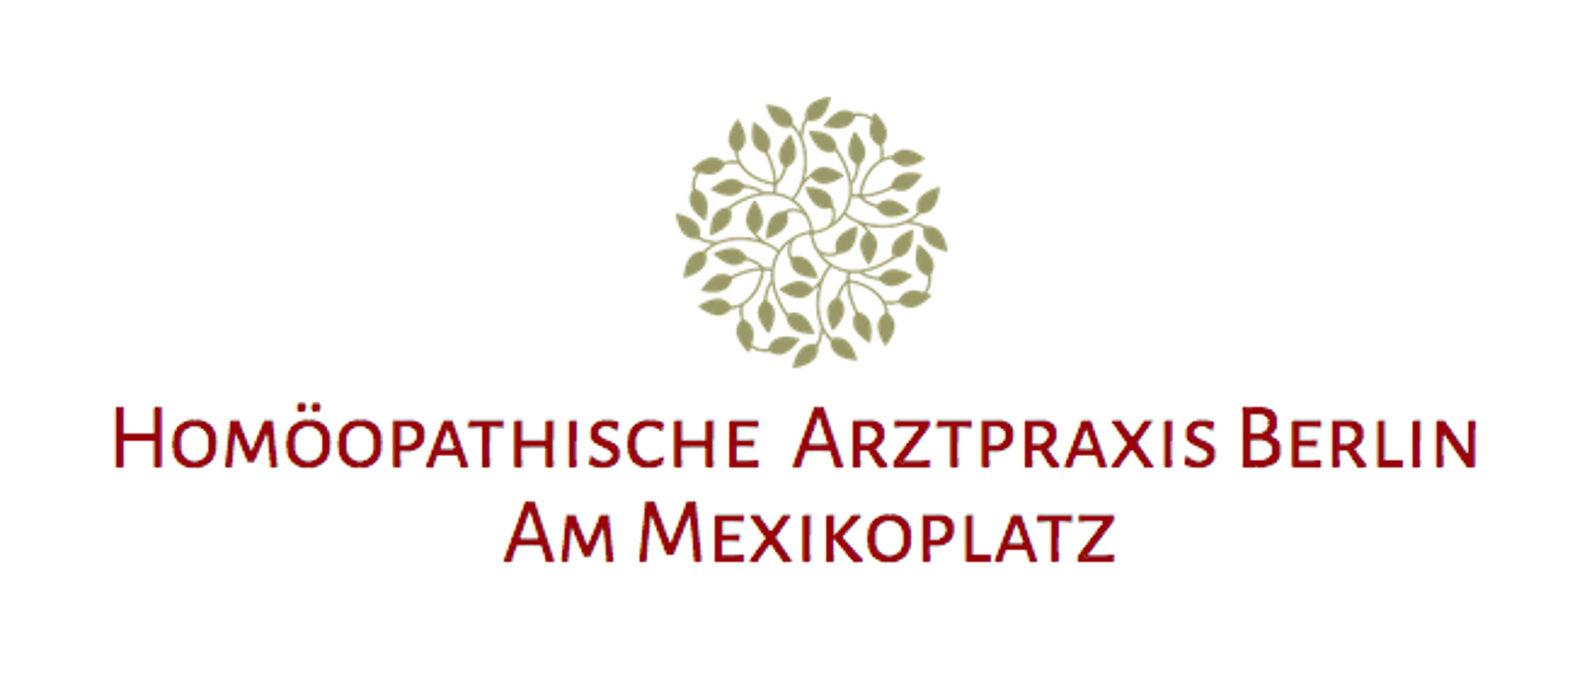 Bild zu Homöopathische Arztpraxis Berlin am Mexikoplatz in Berlin